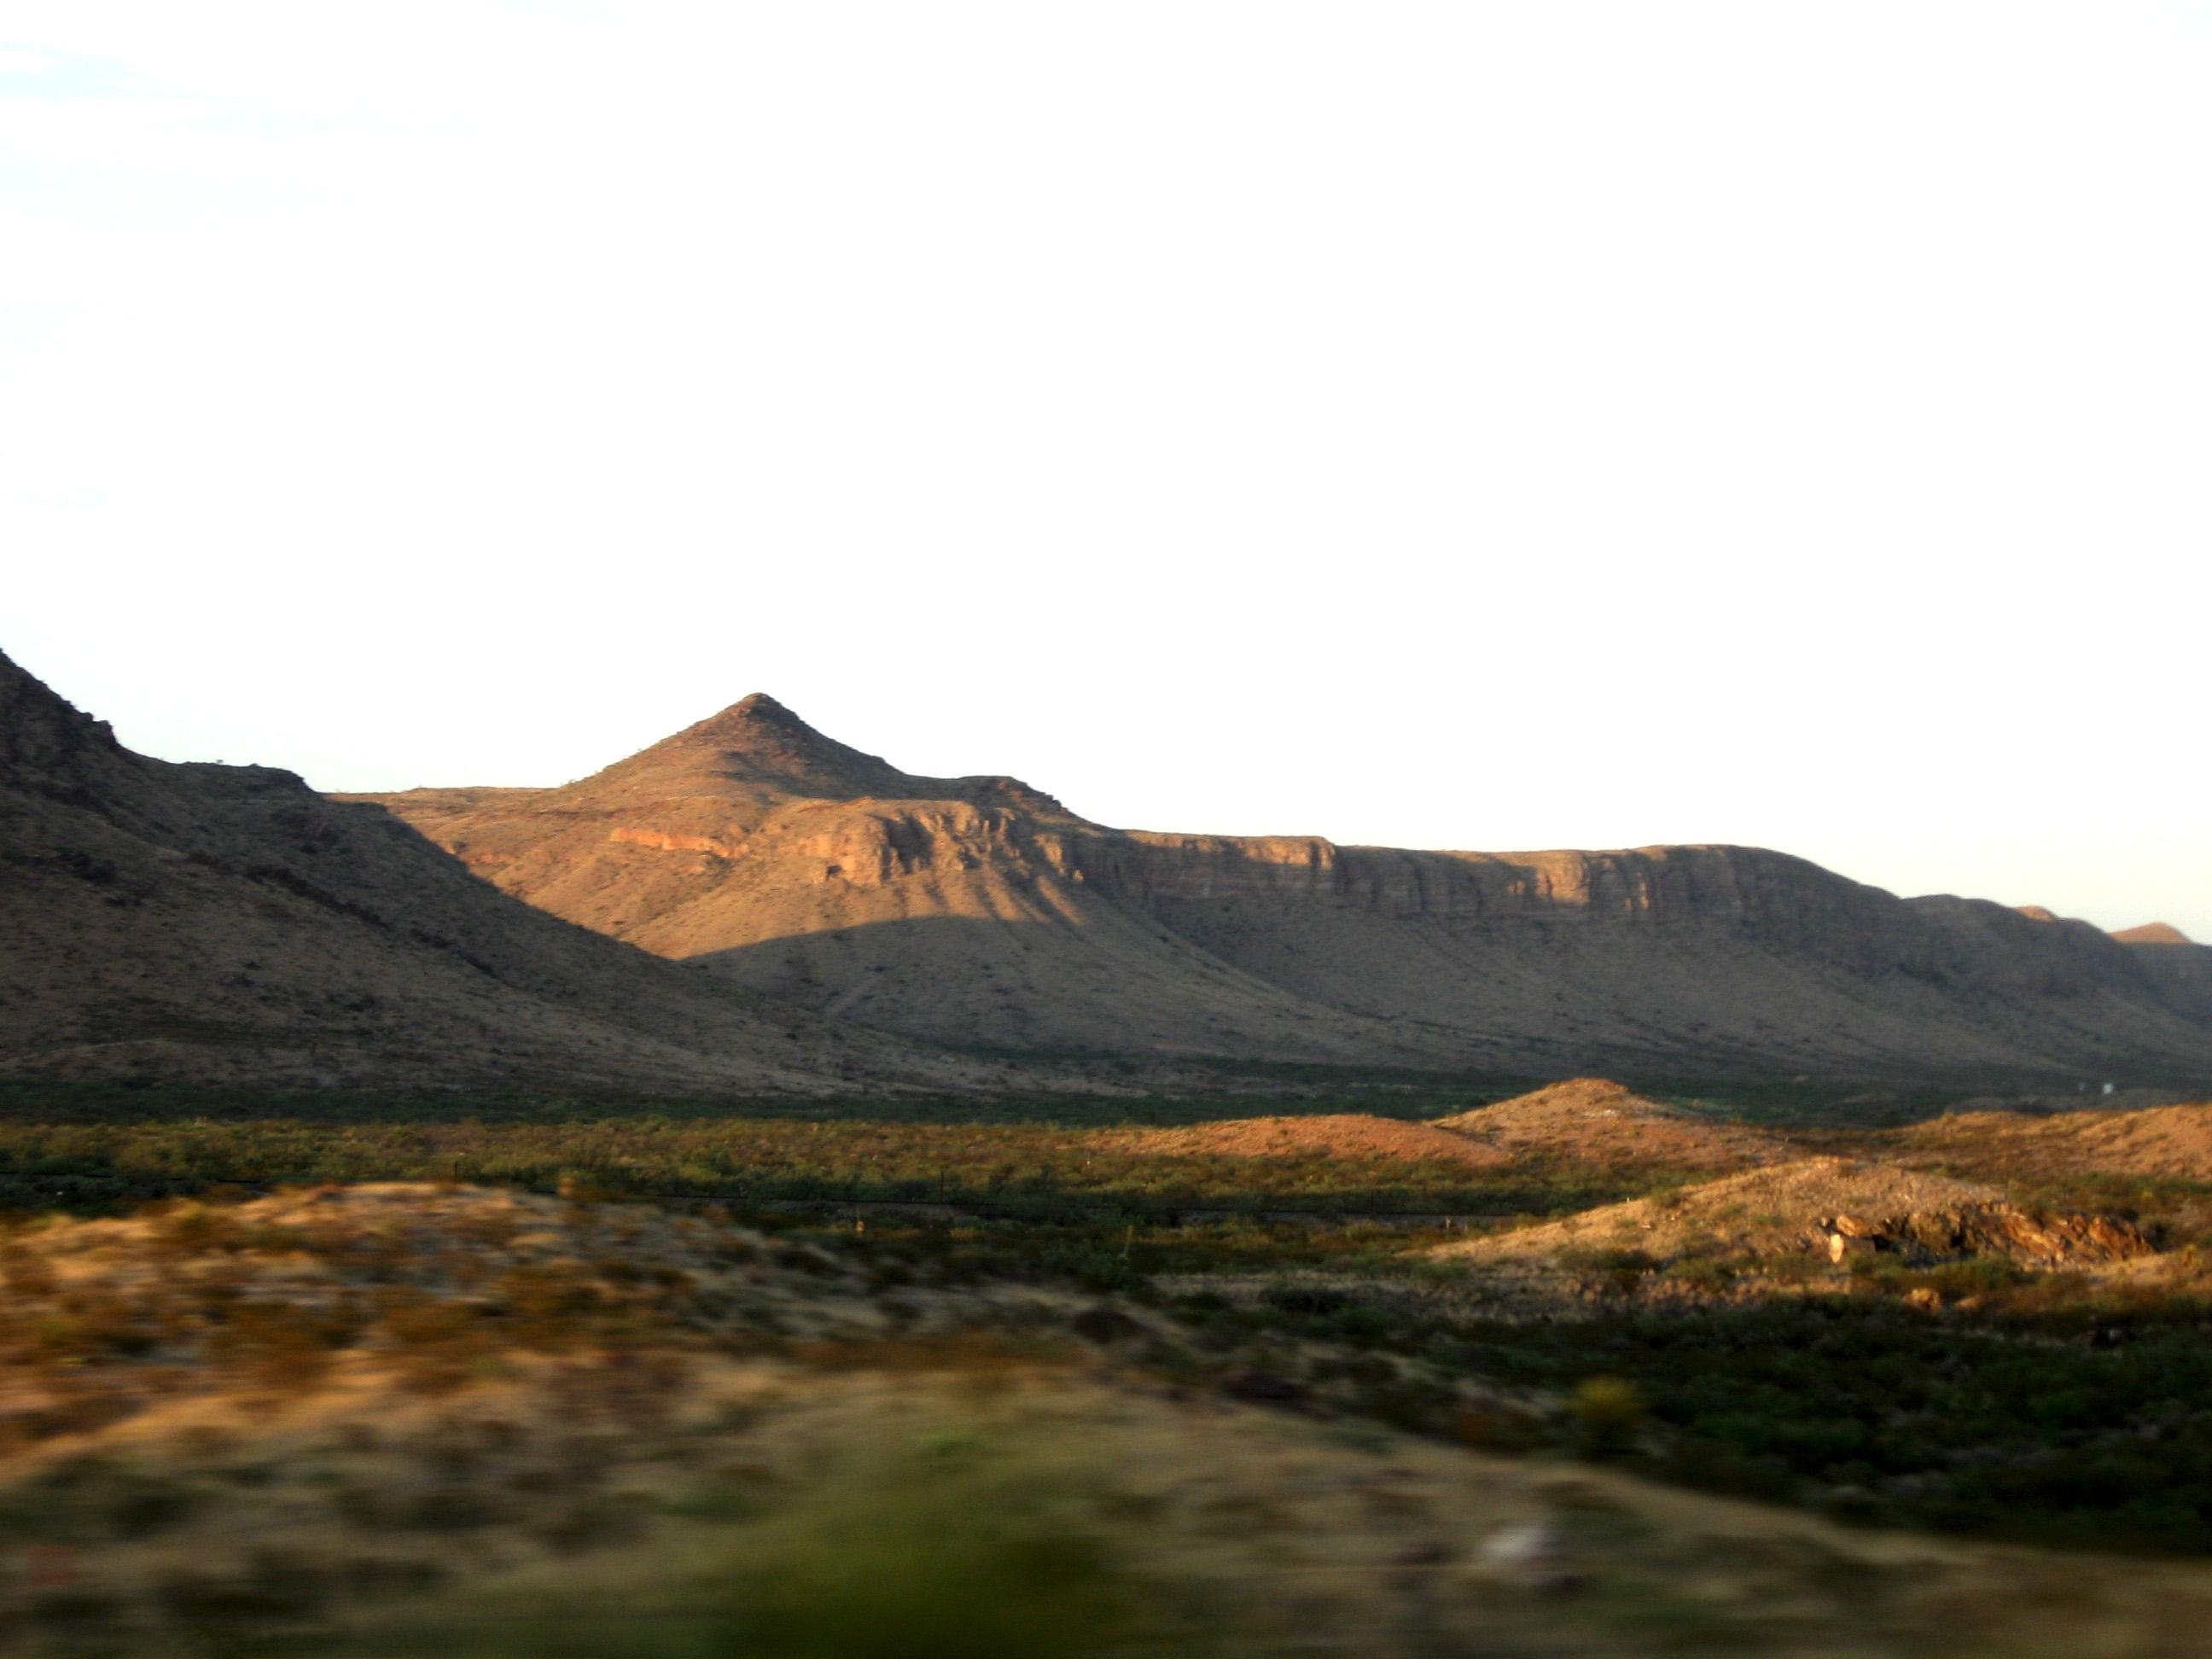 Description West Texas Scenery.JPG